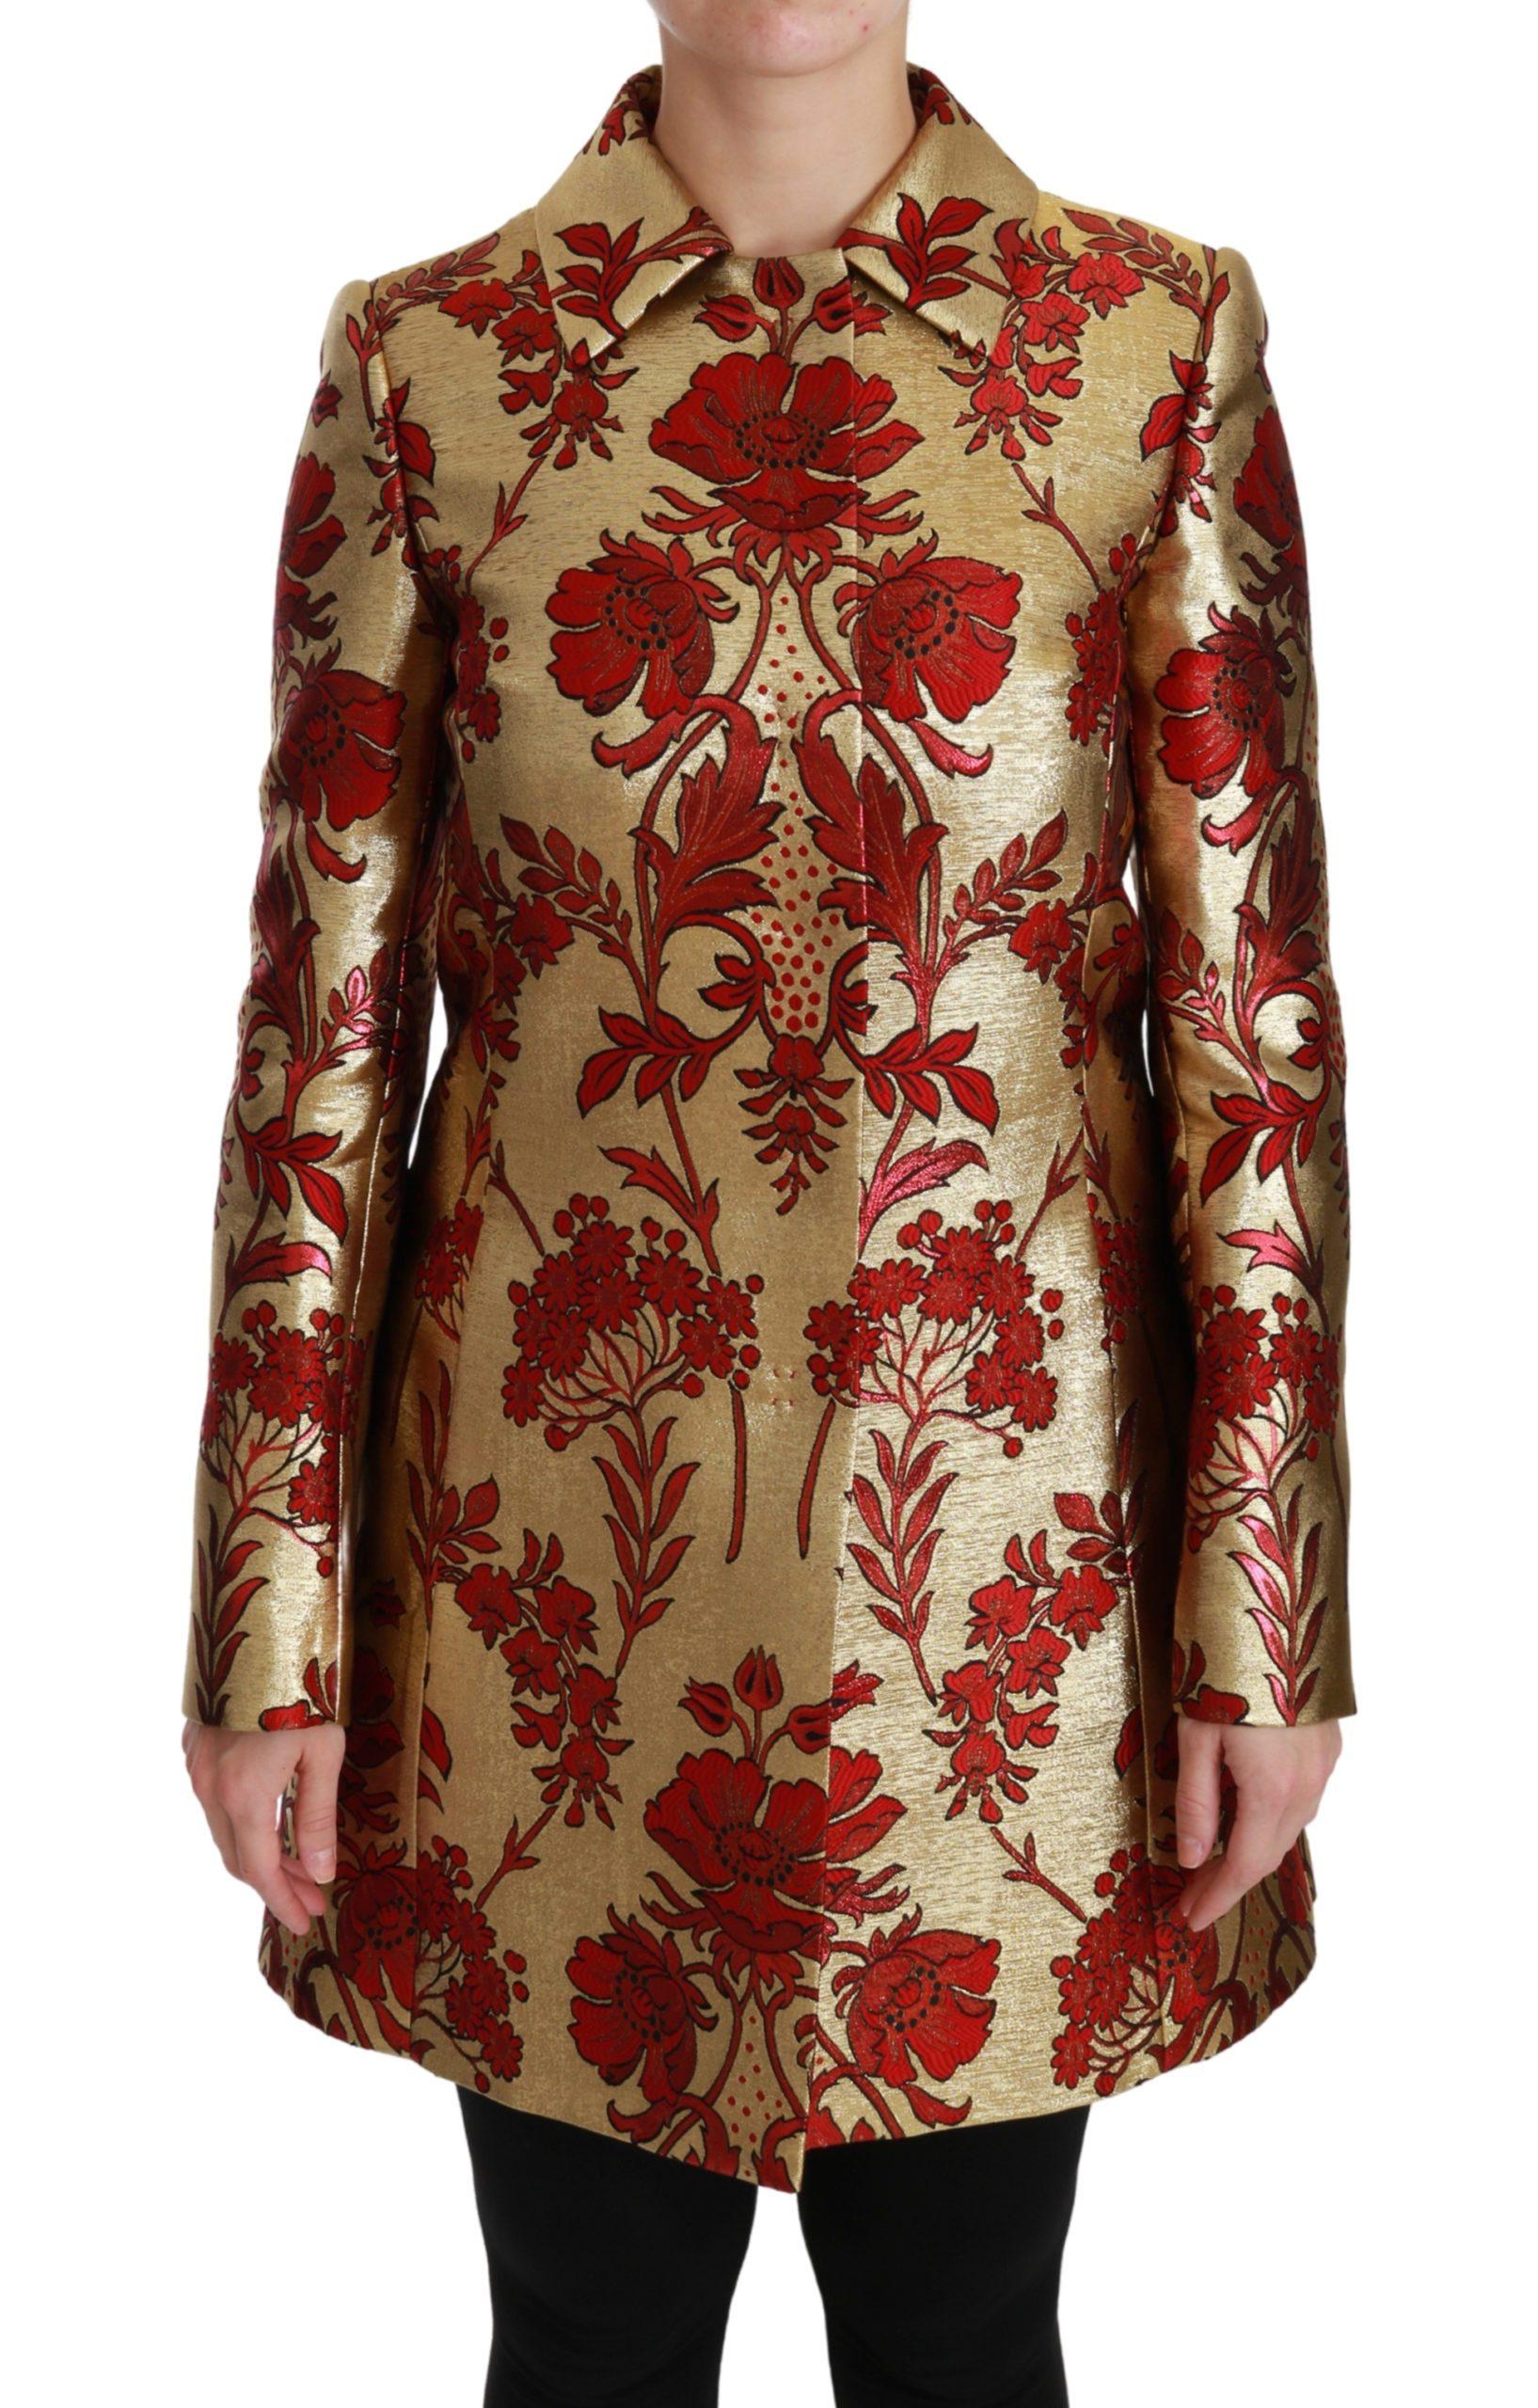 Dolce & Gabbana Women's Floral Brocade Cape Coat Jacket Gold JKT2519 - IT36 | XS